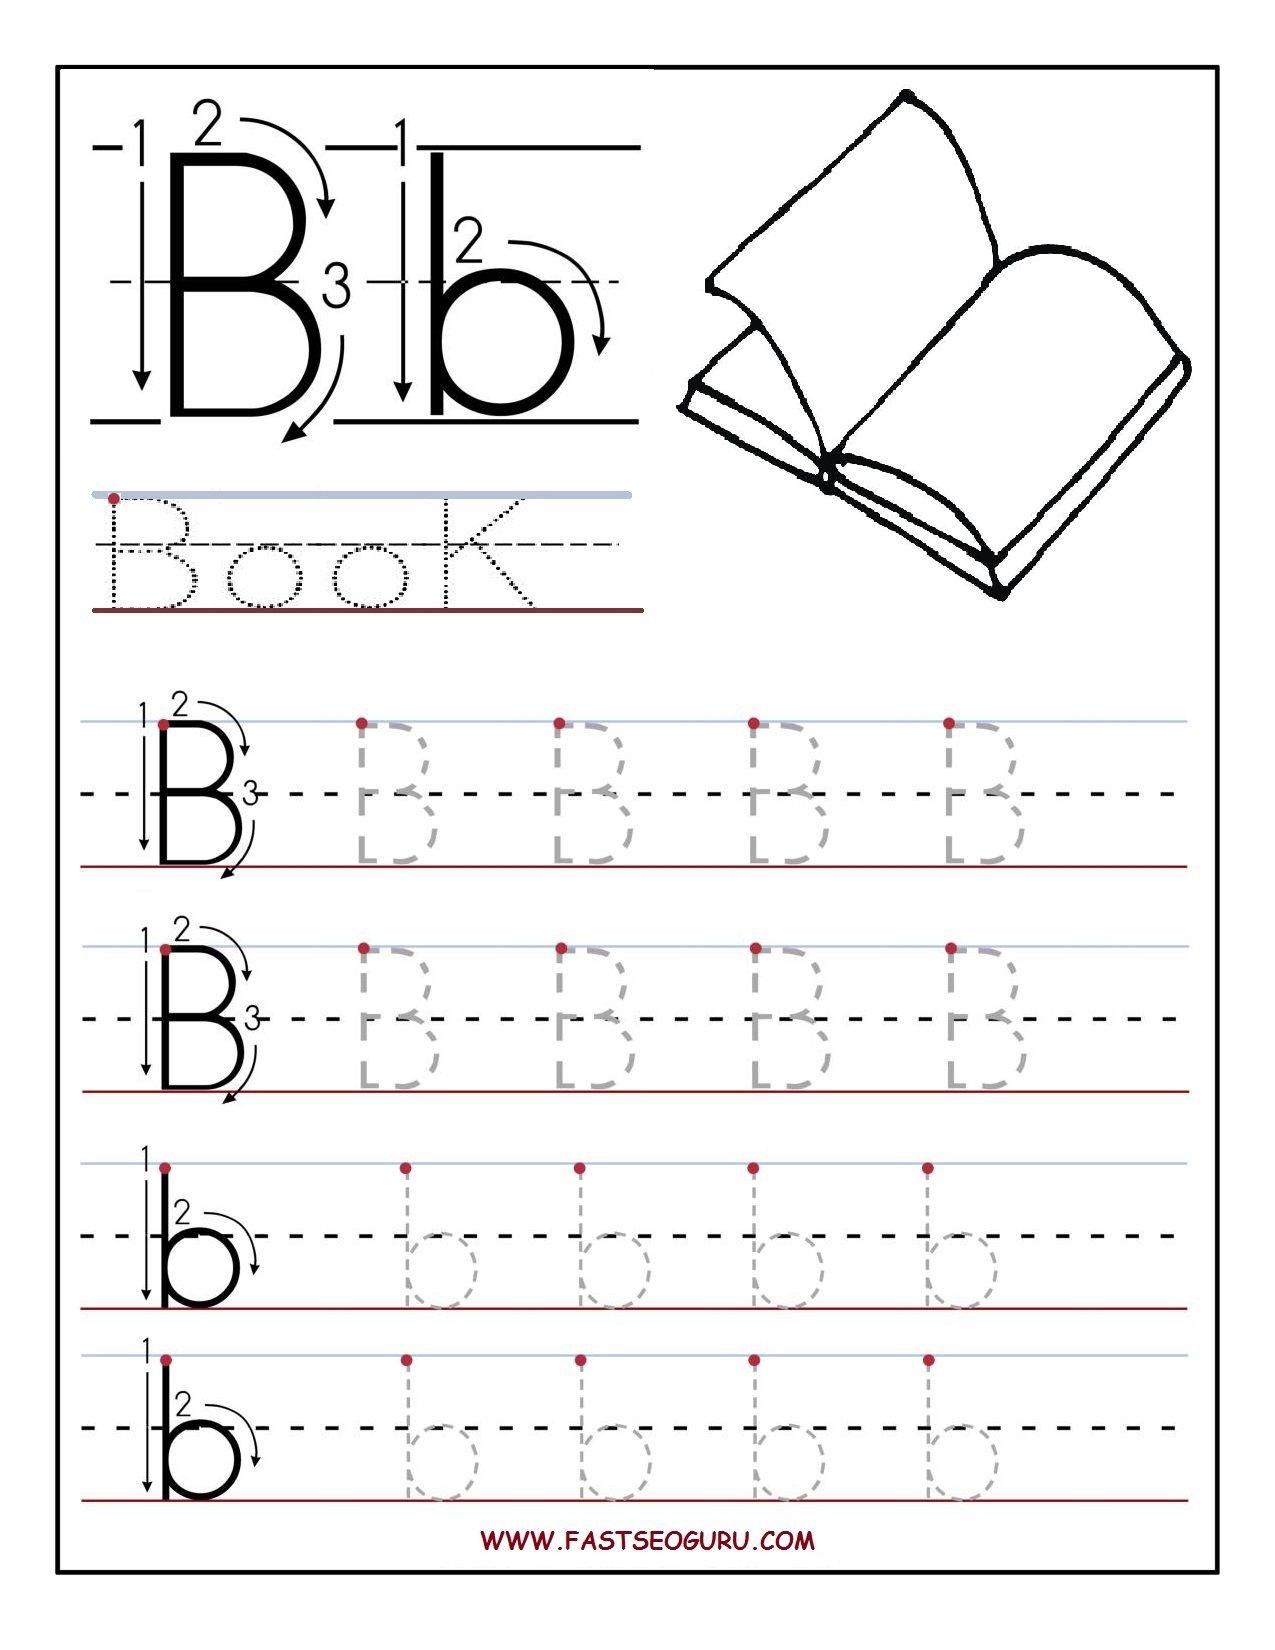 letter b worksheets for preschoolers | Printable letter B ...